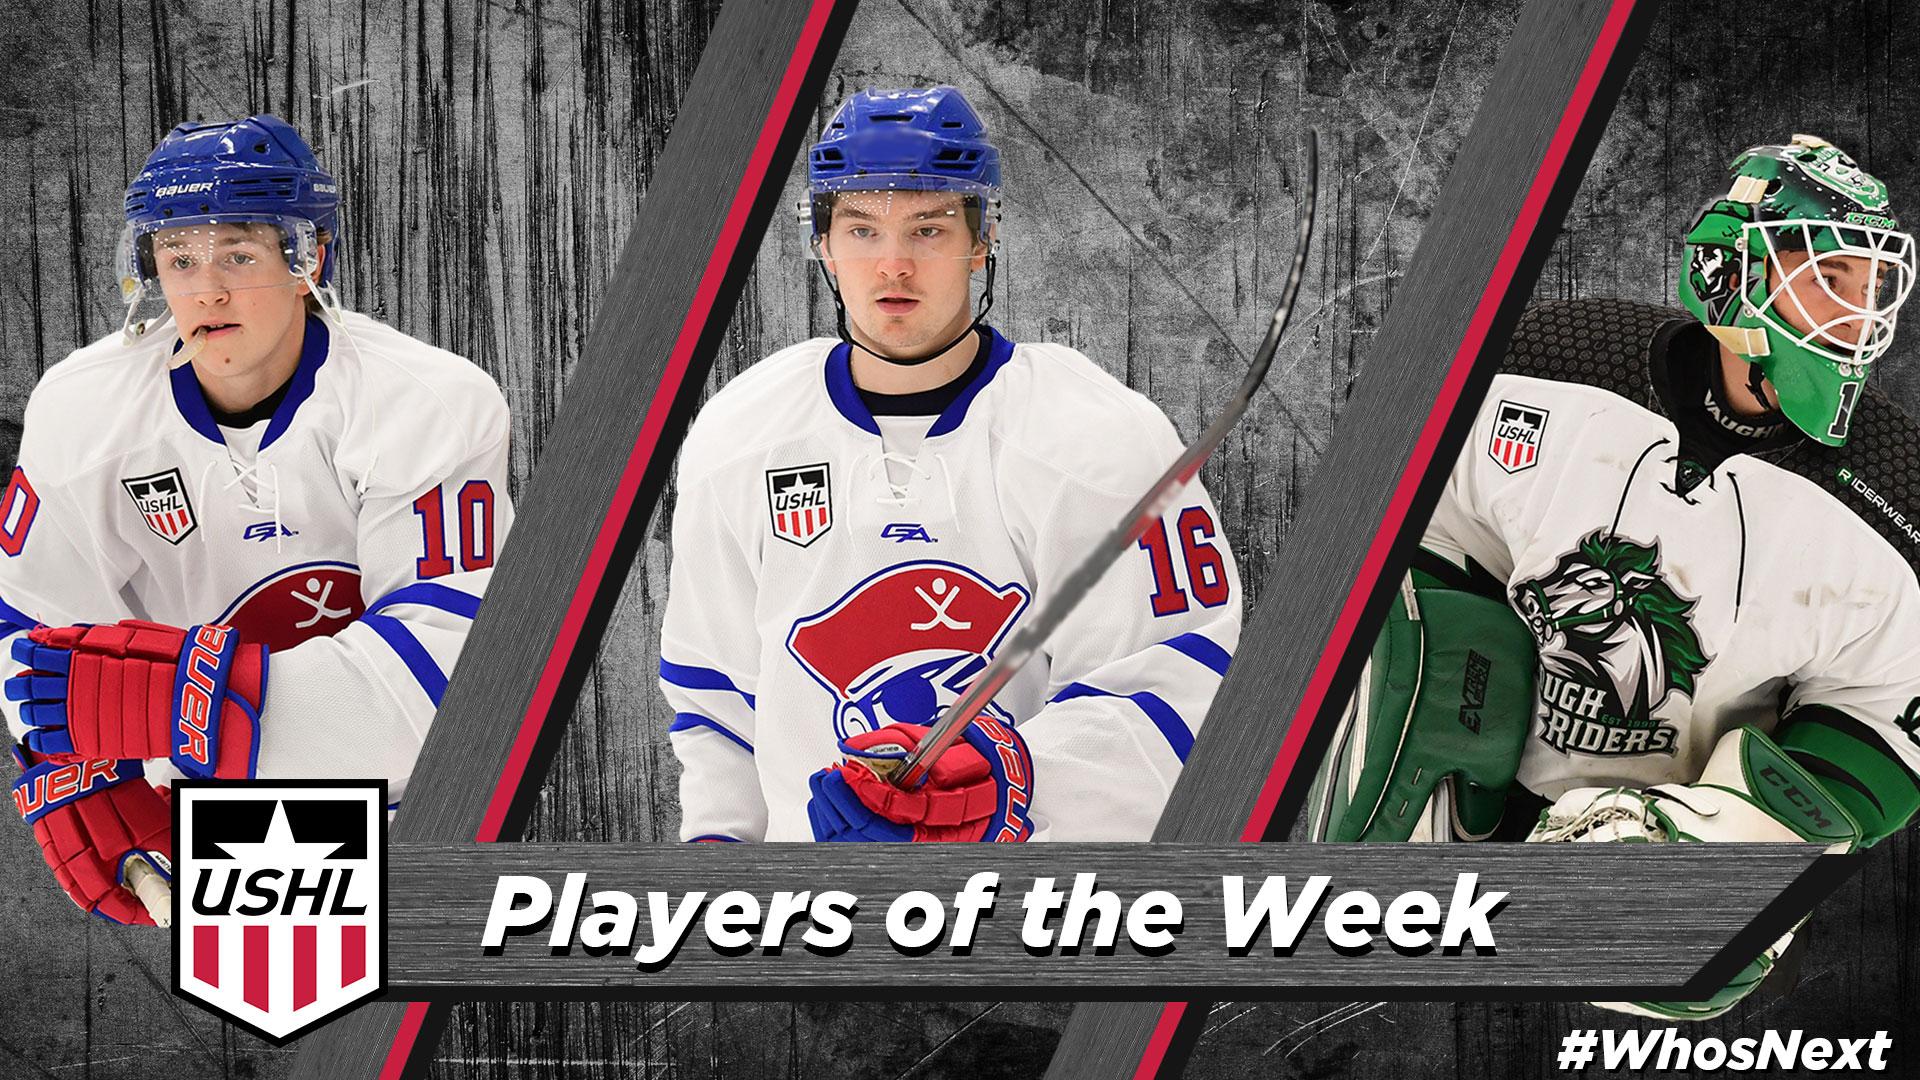 USHL: Players Of The Week - Week 1, 2018-19